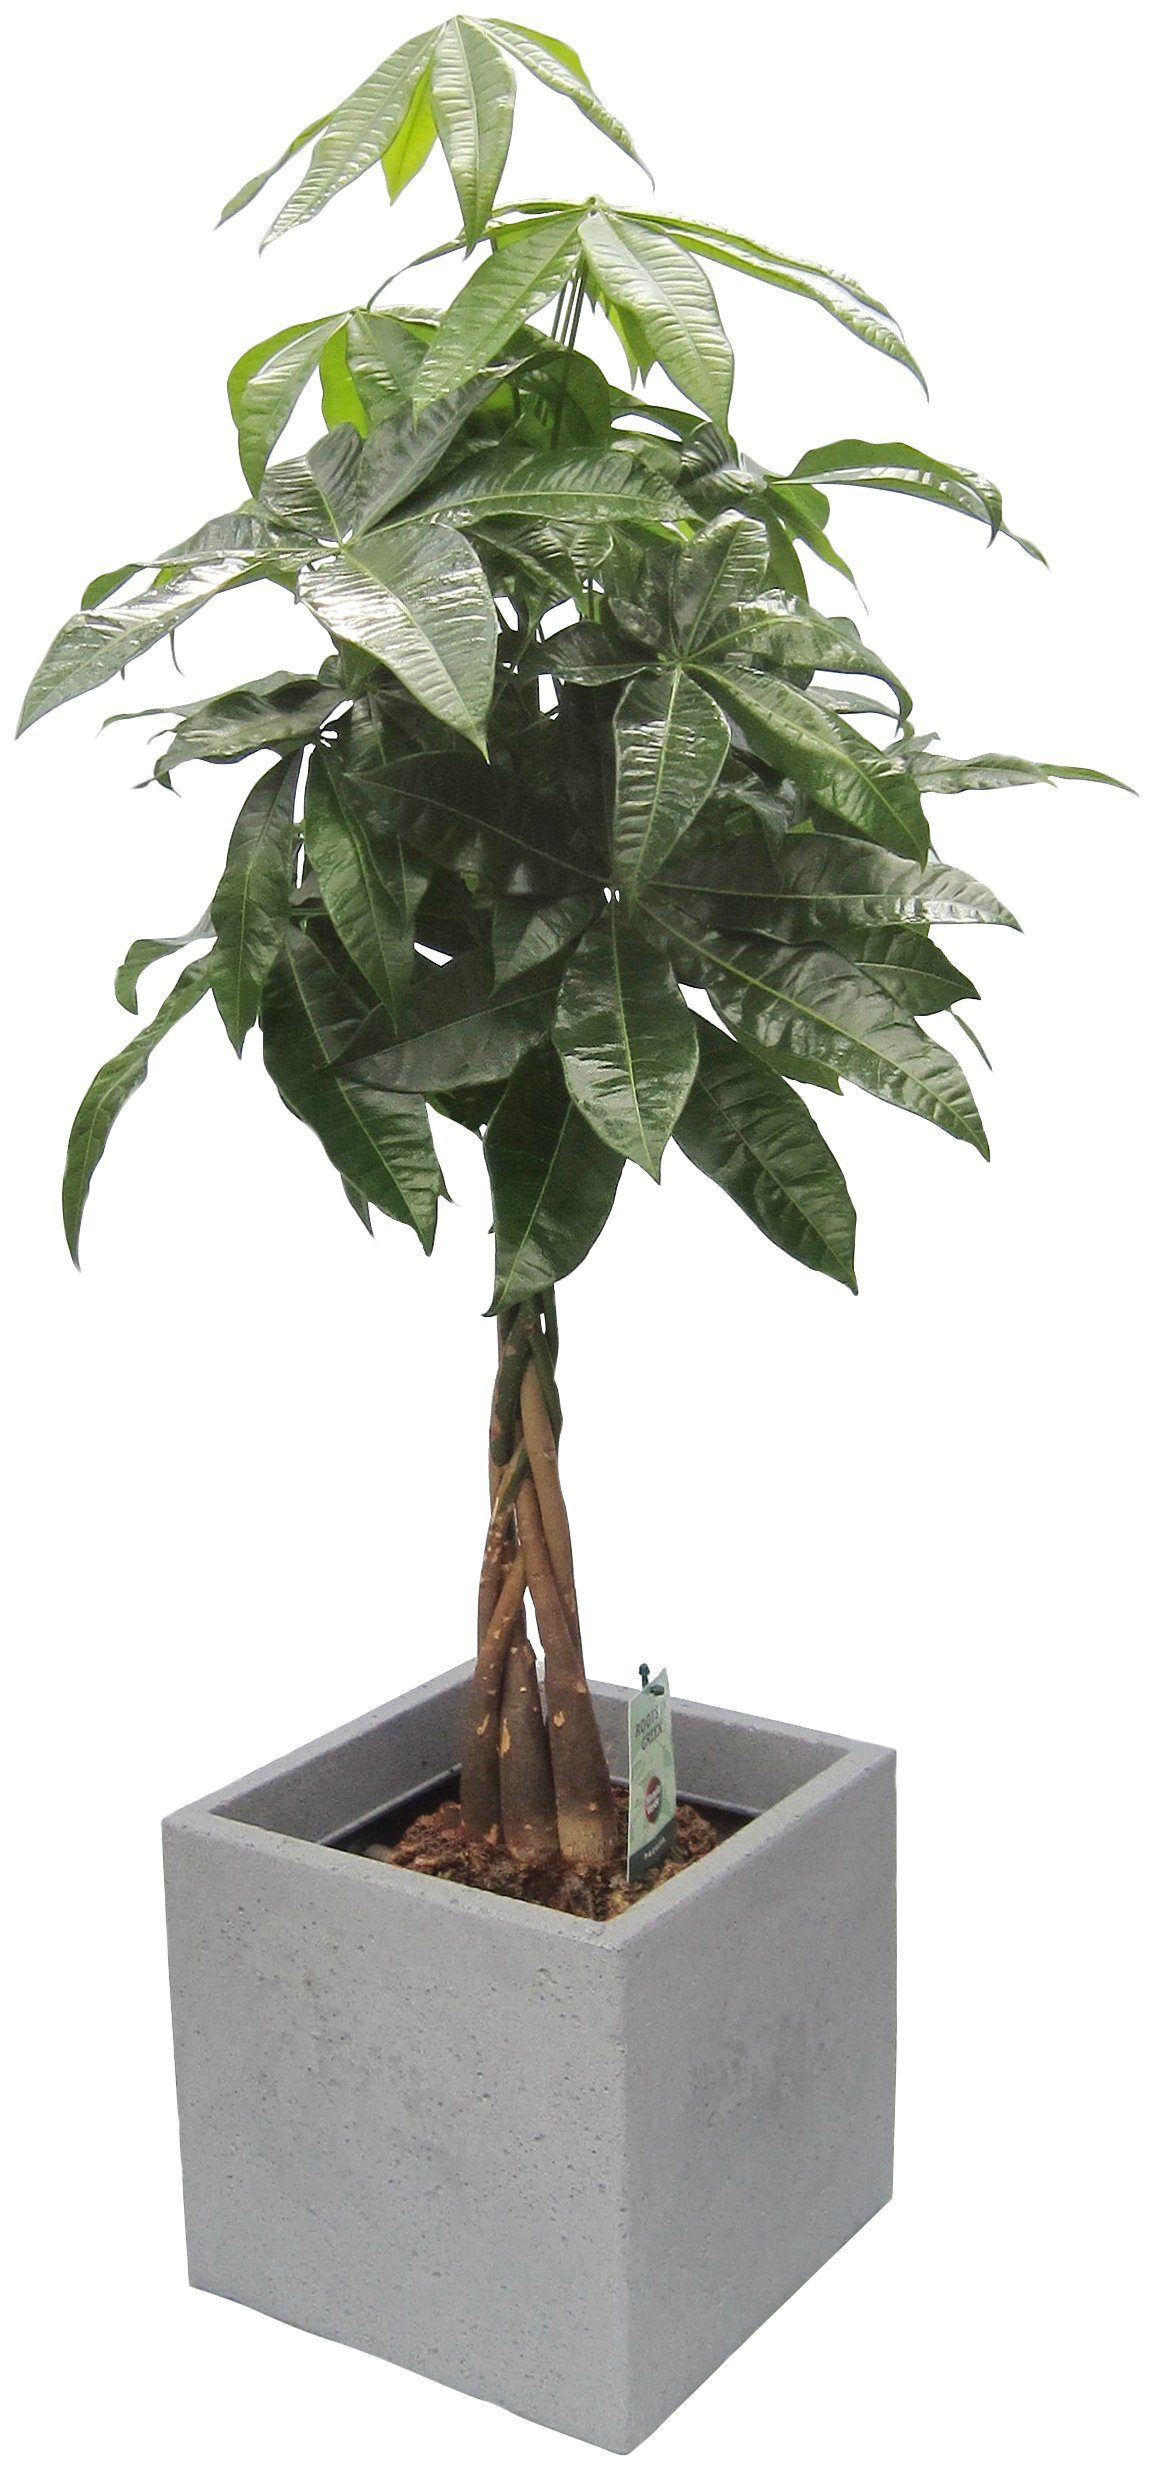 DOMINIK Zimmerpflanze »Pachira«, Höhe: 60 cm, 1 Pflanze im Dekotopf